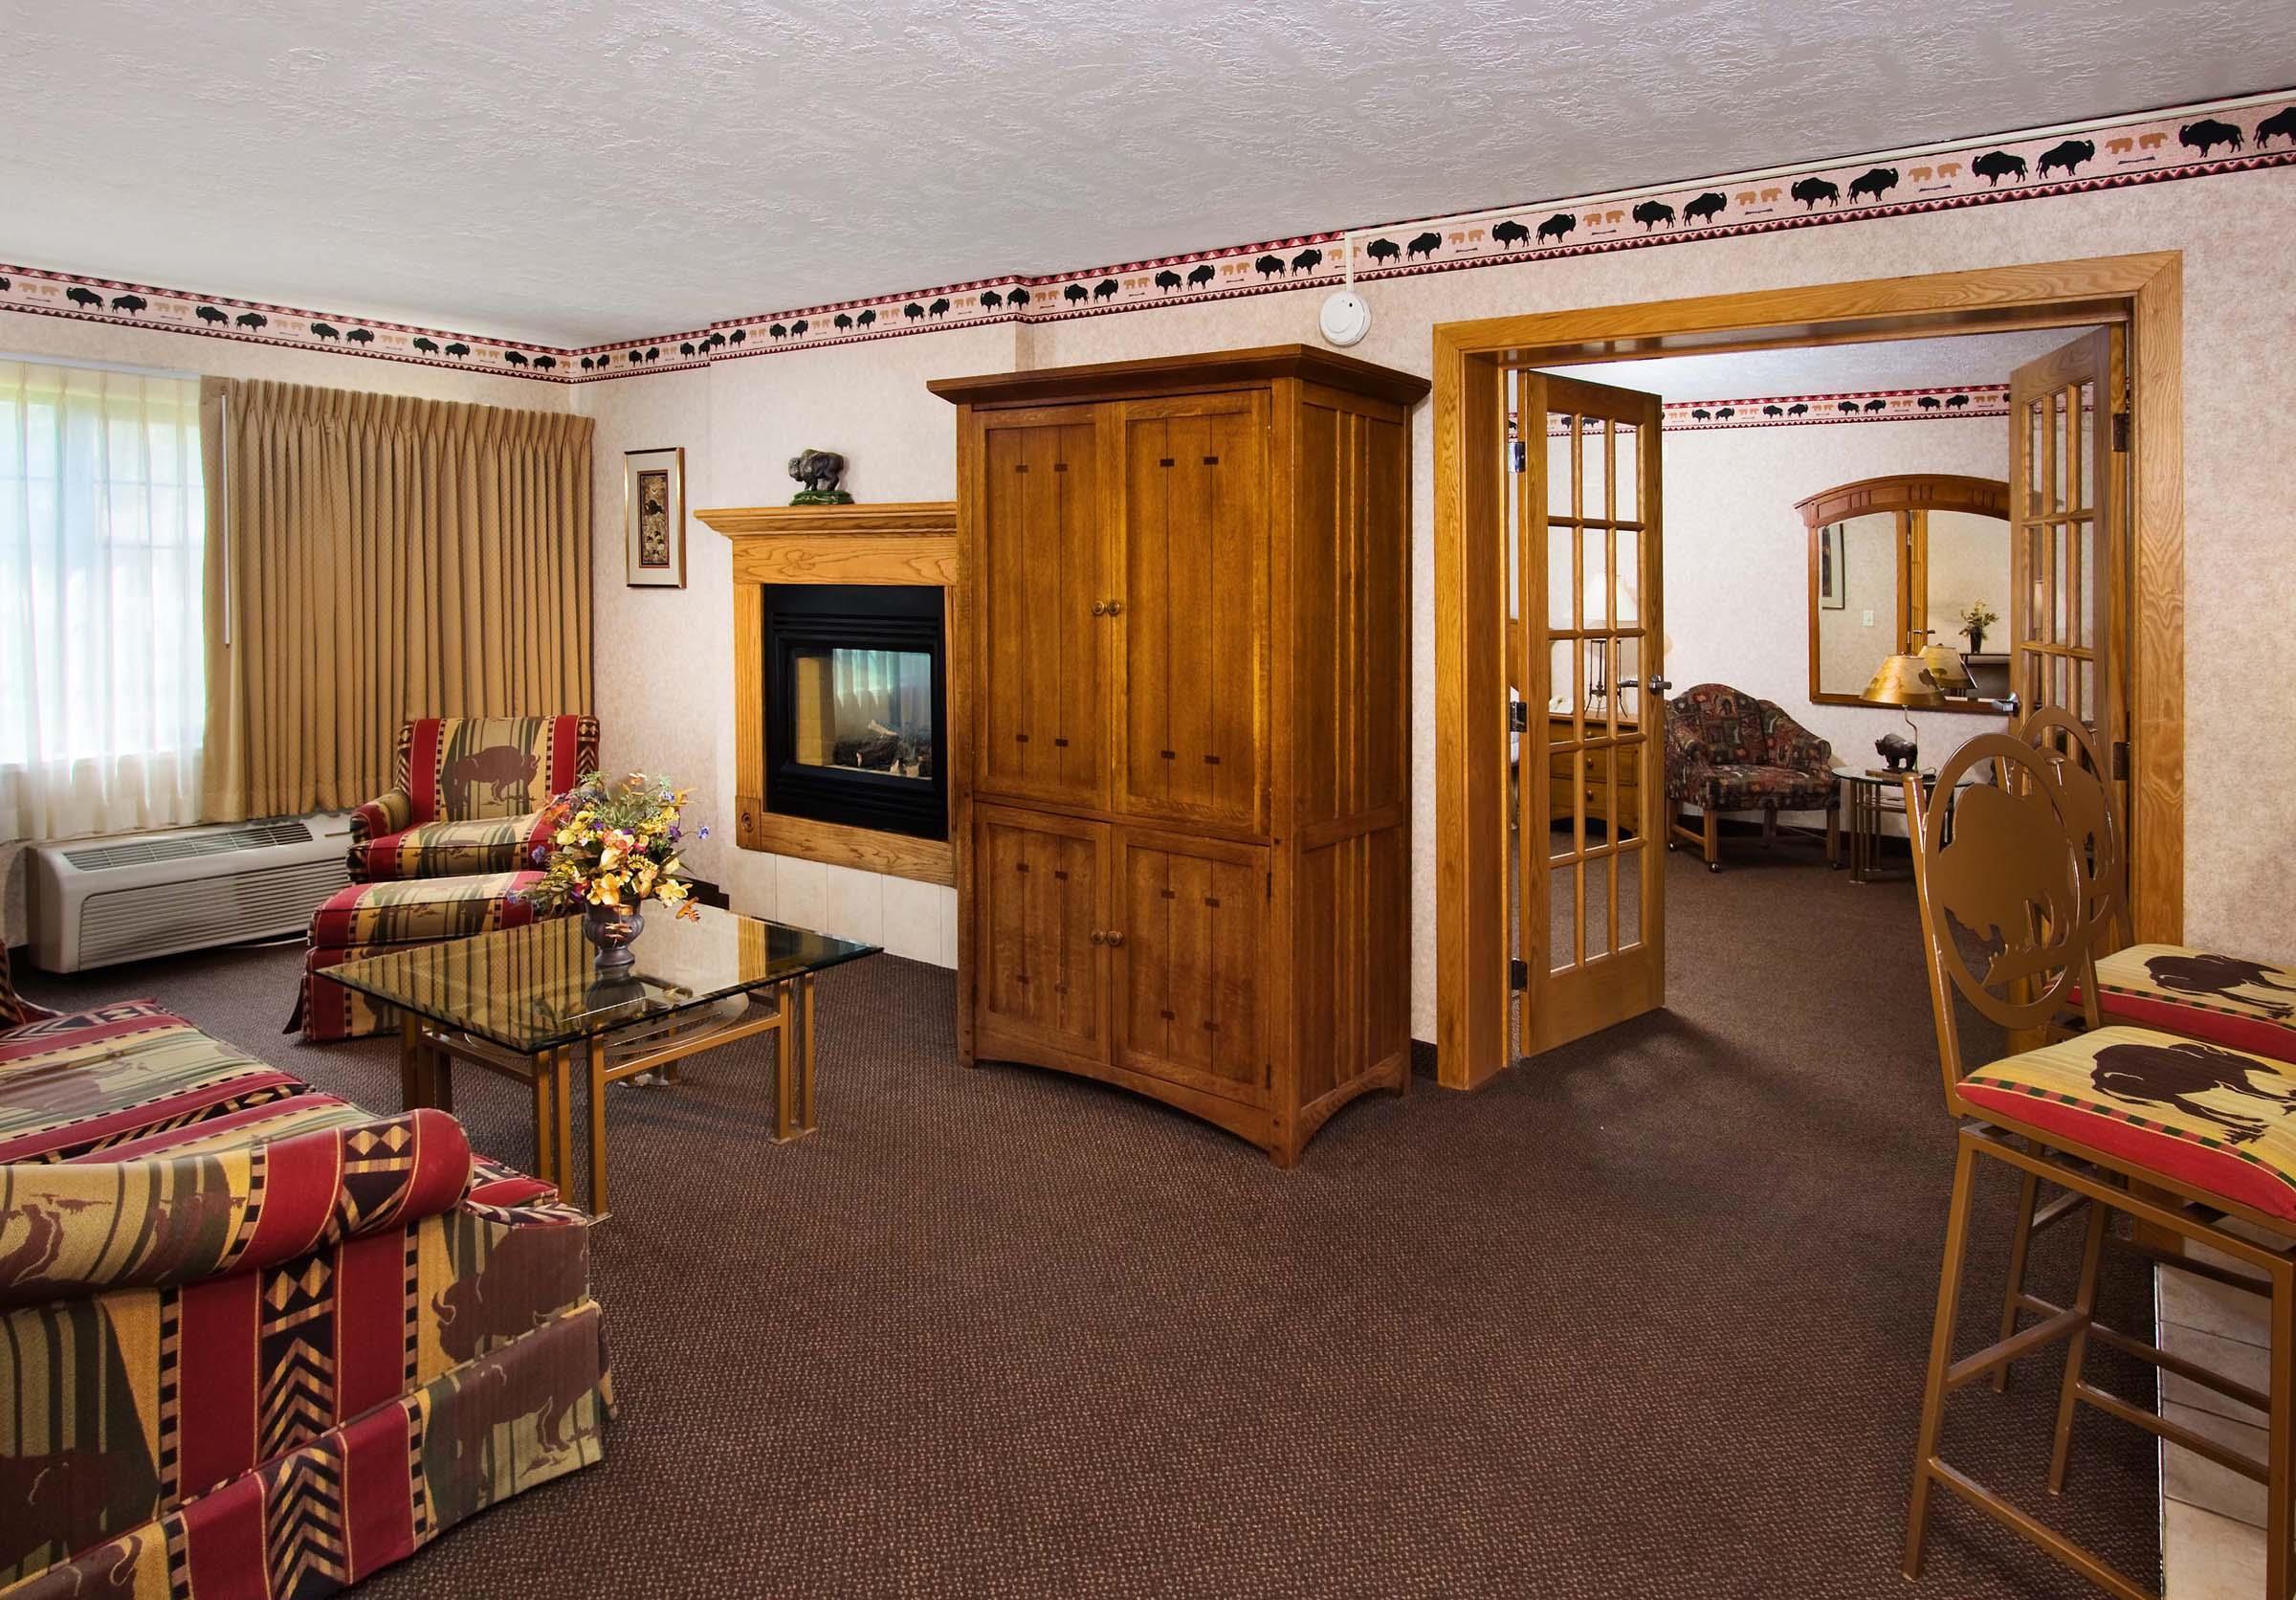 Best Western Ramkota Hotel image 19